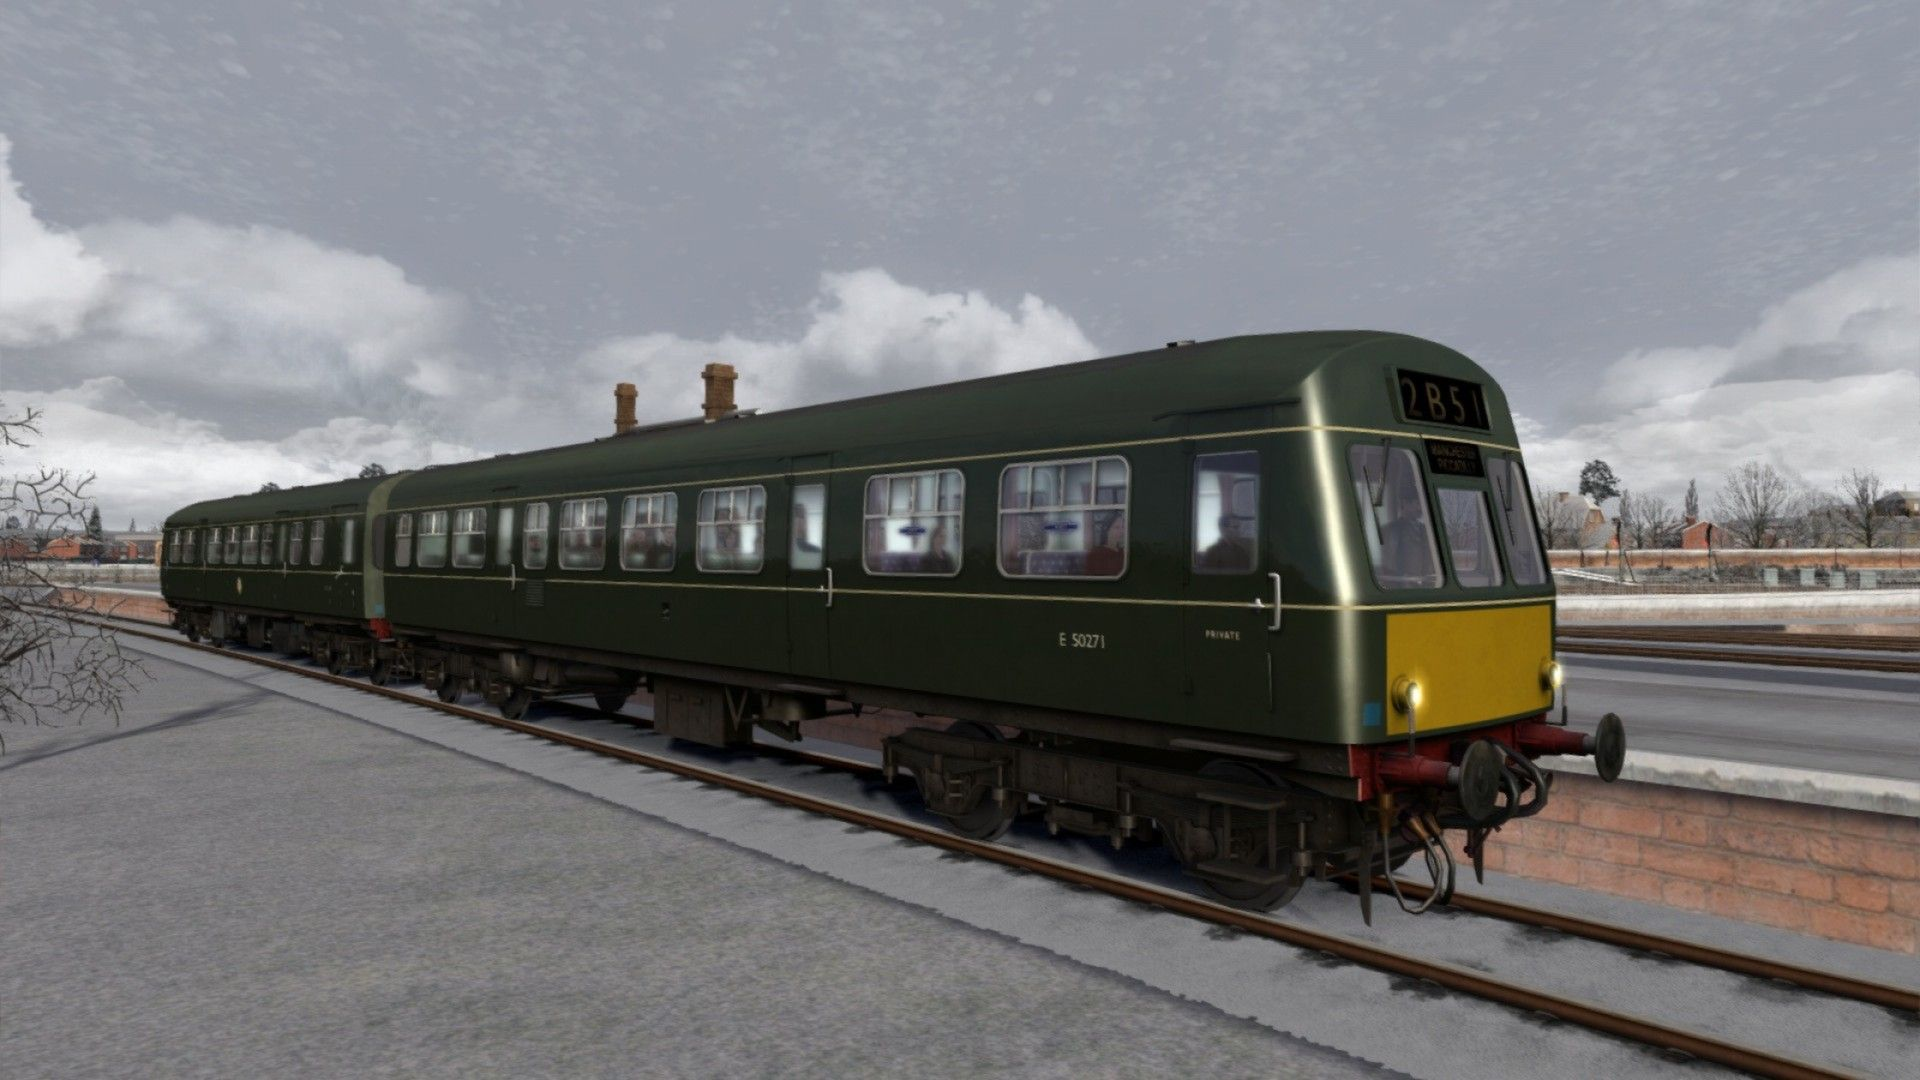 BR1111